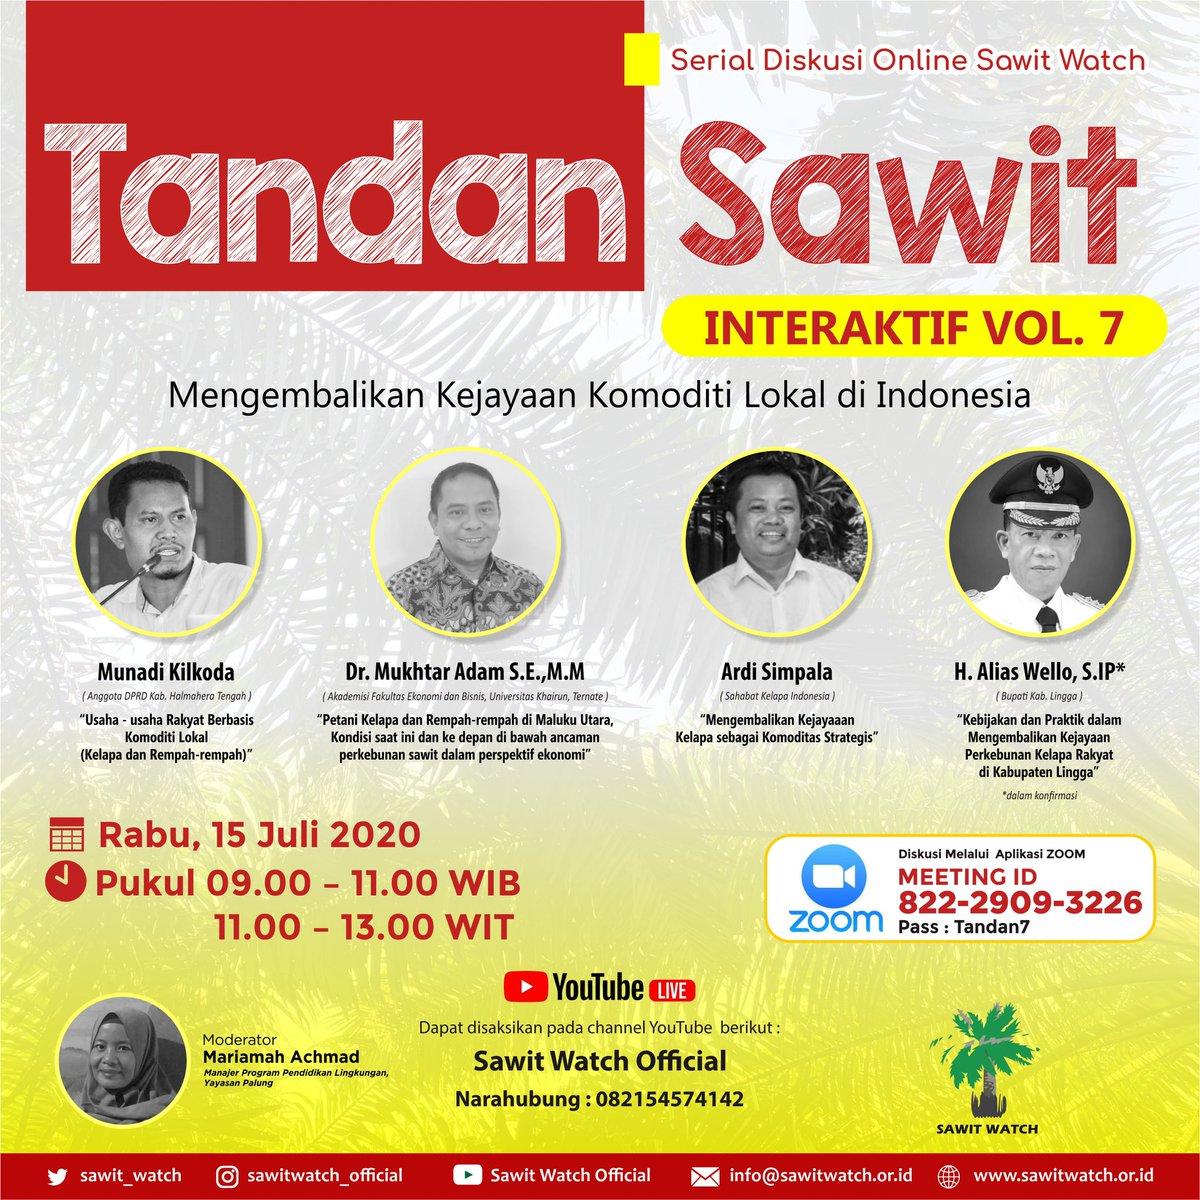 TANDAN SAWIT INTERAKTIF [VOL.7]  Mengembalikan Kejayaan Komoditi Lokal di Indonesia.  Rabu, 15 Juli 2020 pukul 09.00 - 11.00 WIB atau 11.00 - 13.00 WIT  #tandansawitinteraktif #diskusionlinesawitwatch https://t.co/wqJwKIOMdh